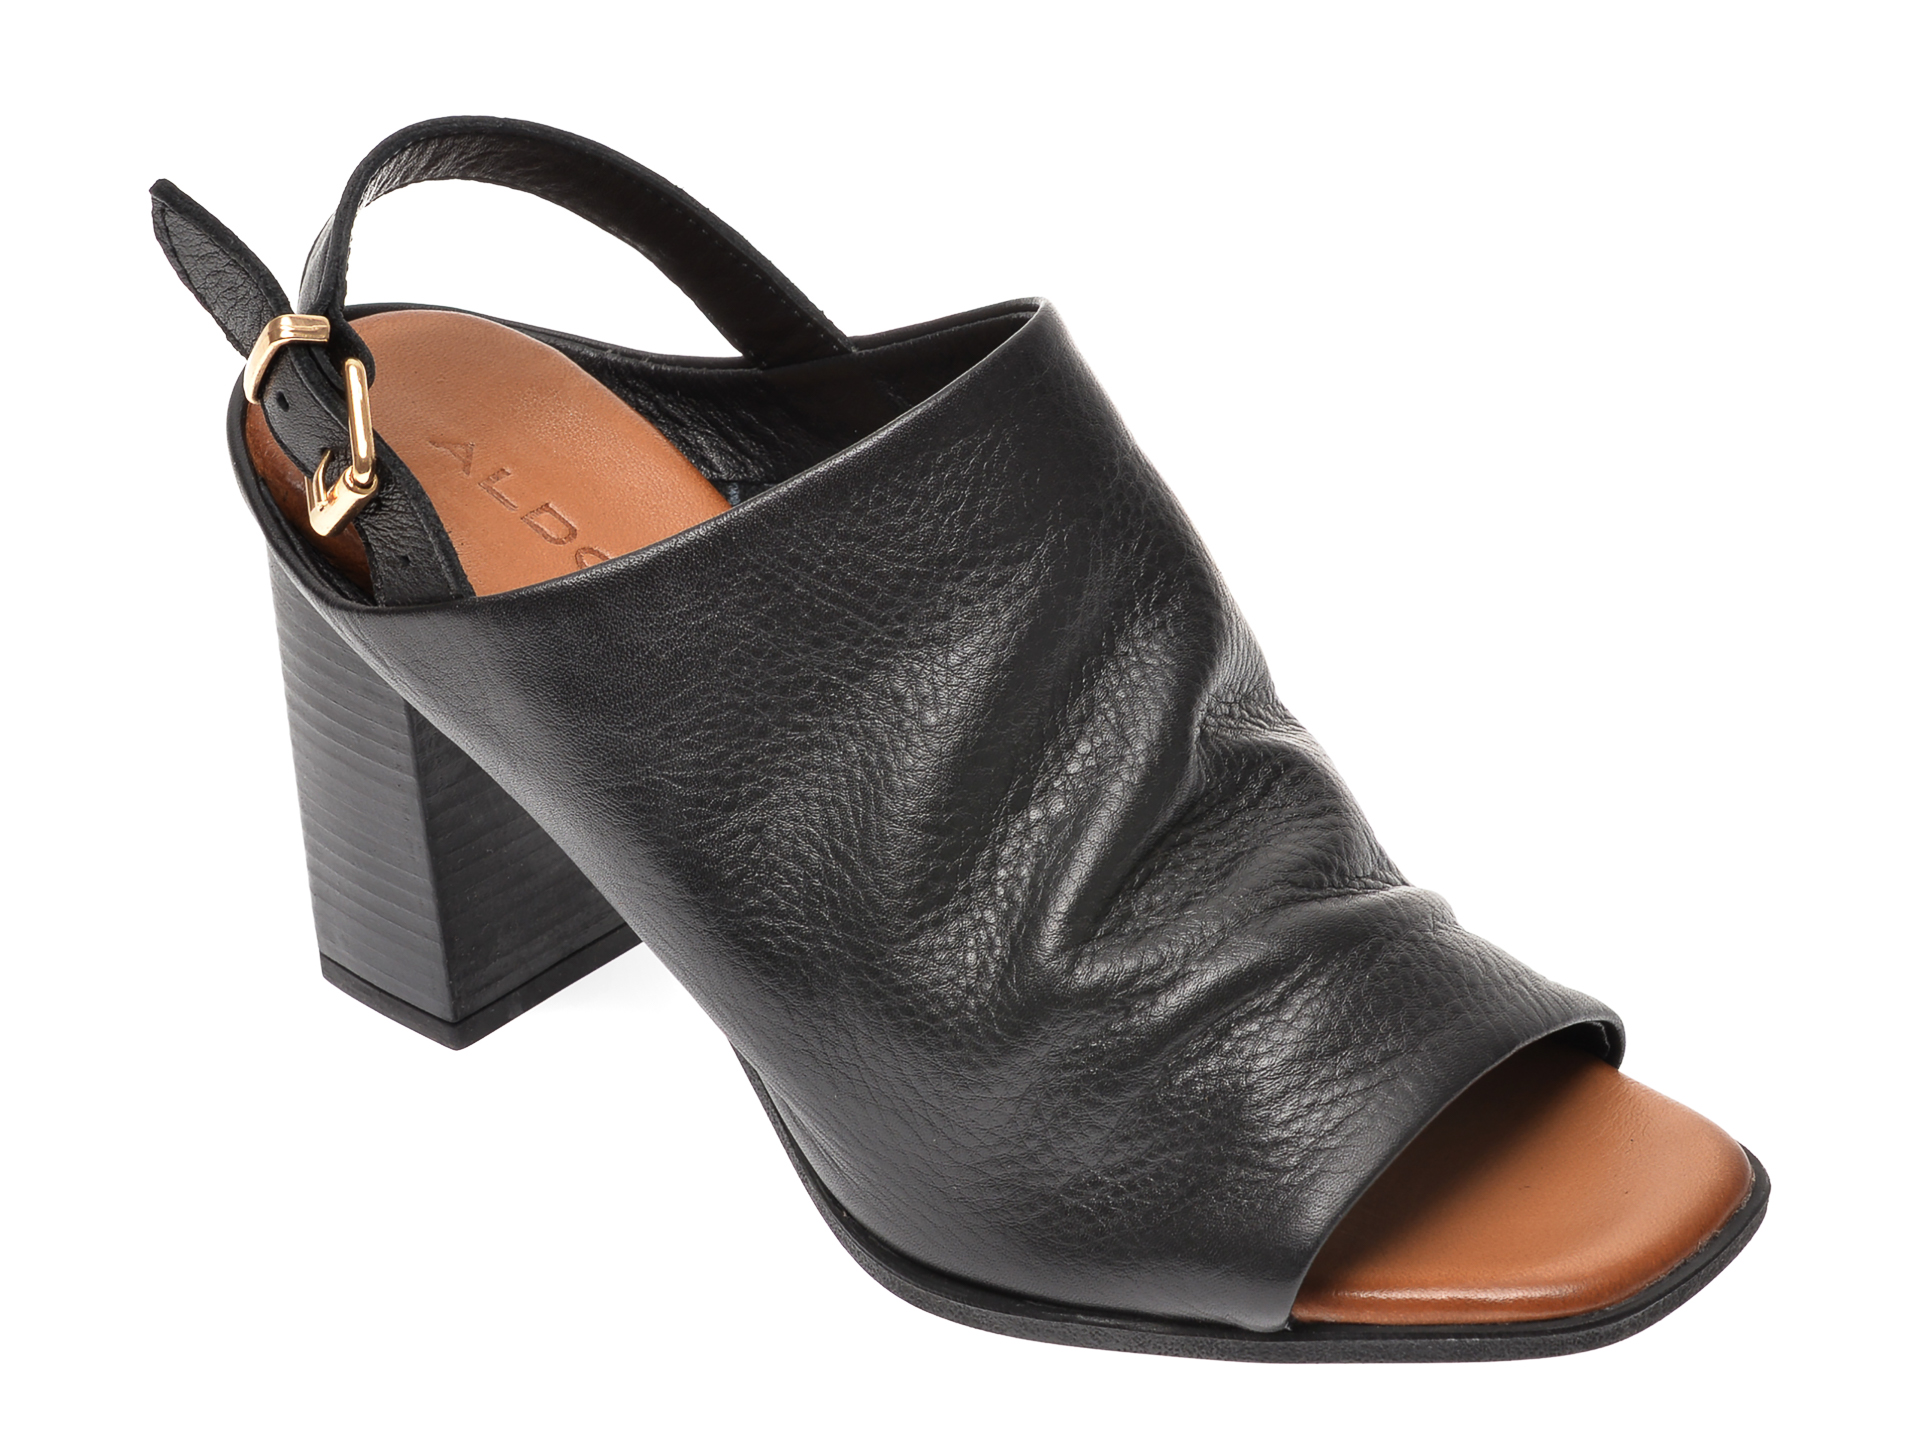 Sandale ALDO negre, Casameada001, din piele naturala imagine otter.ro